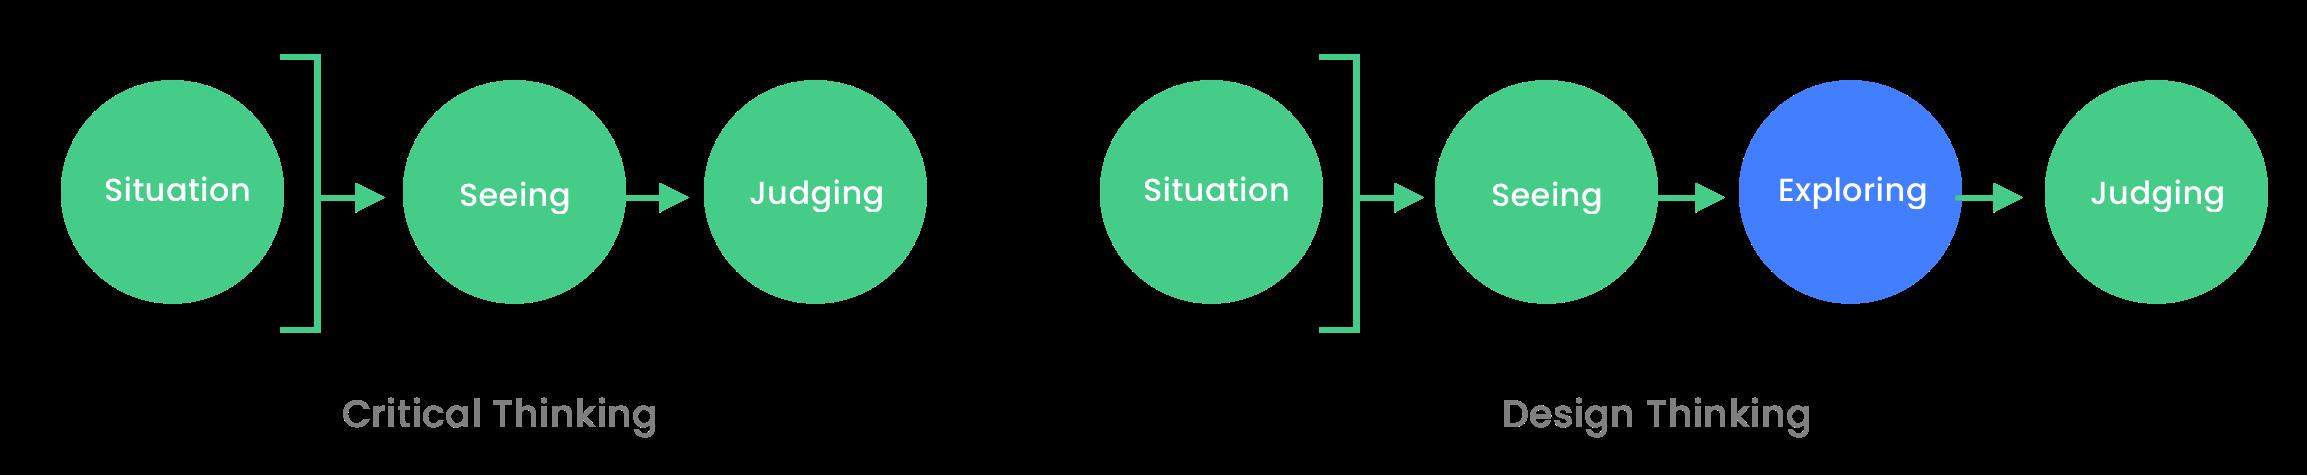 Critical Thinking & Design Thinking